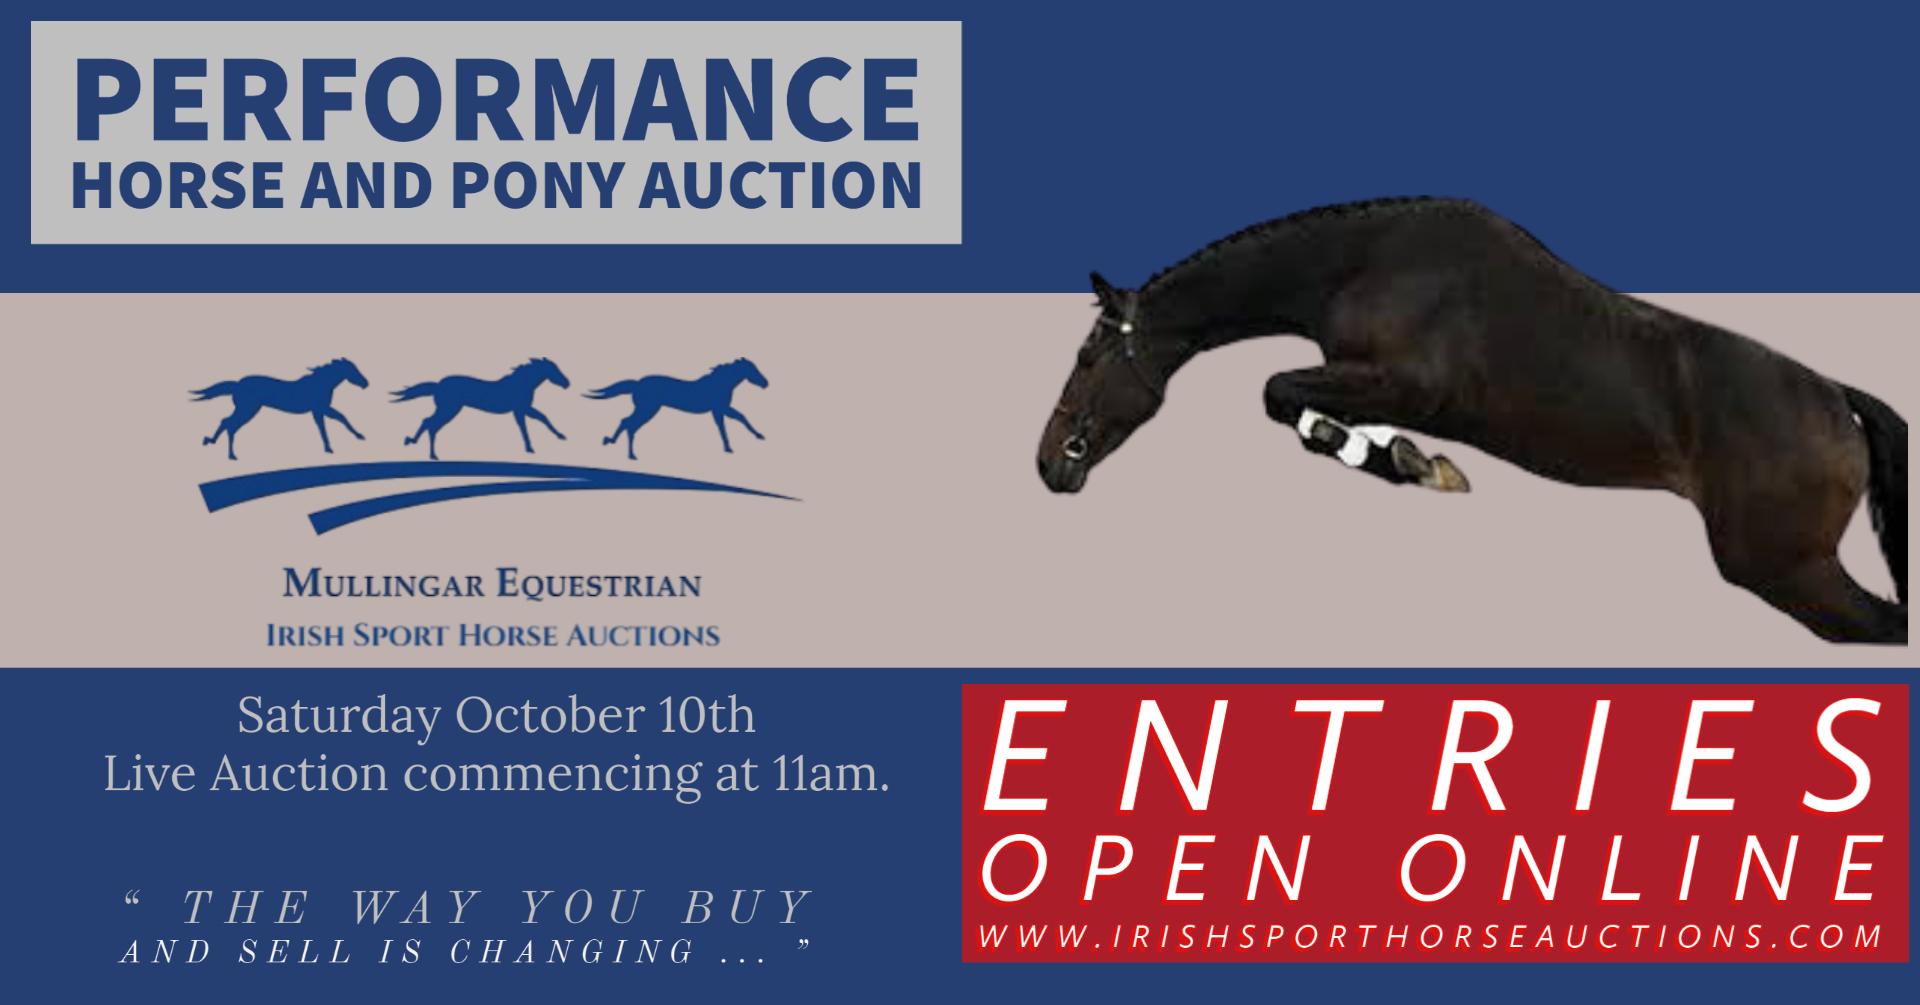 PERFORMANCE HORSE & PONY AUCTION